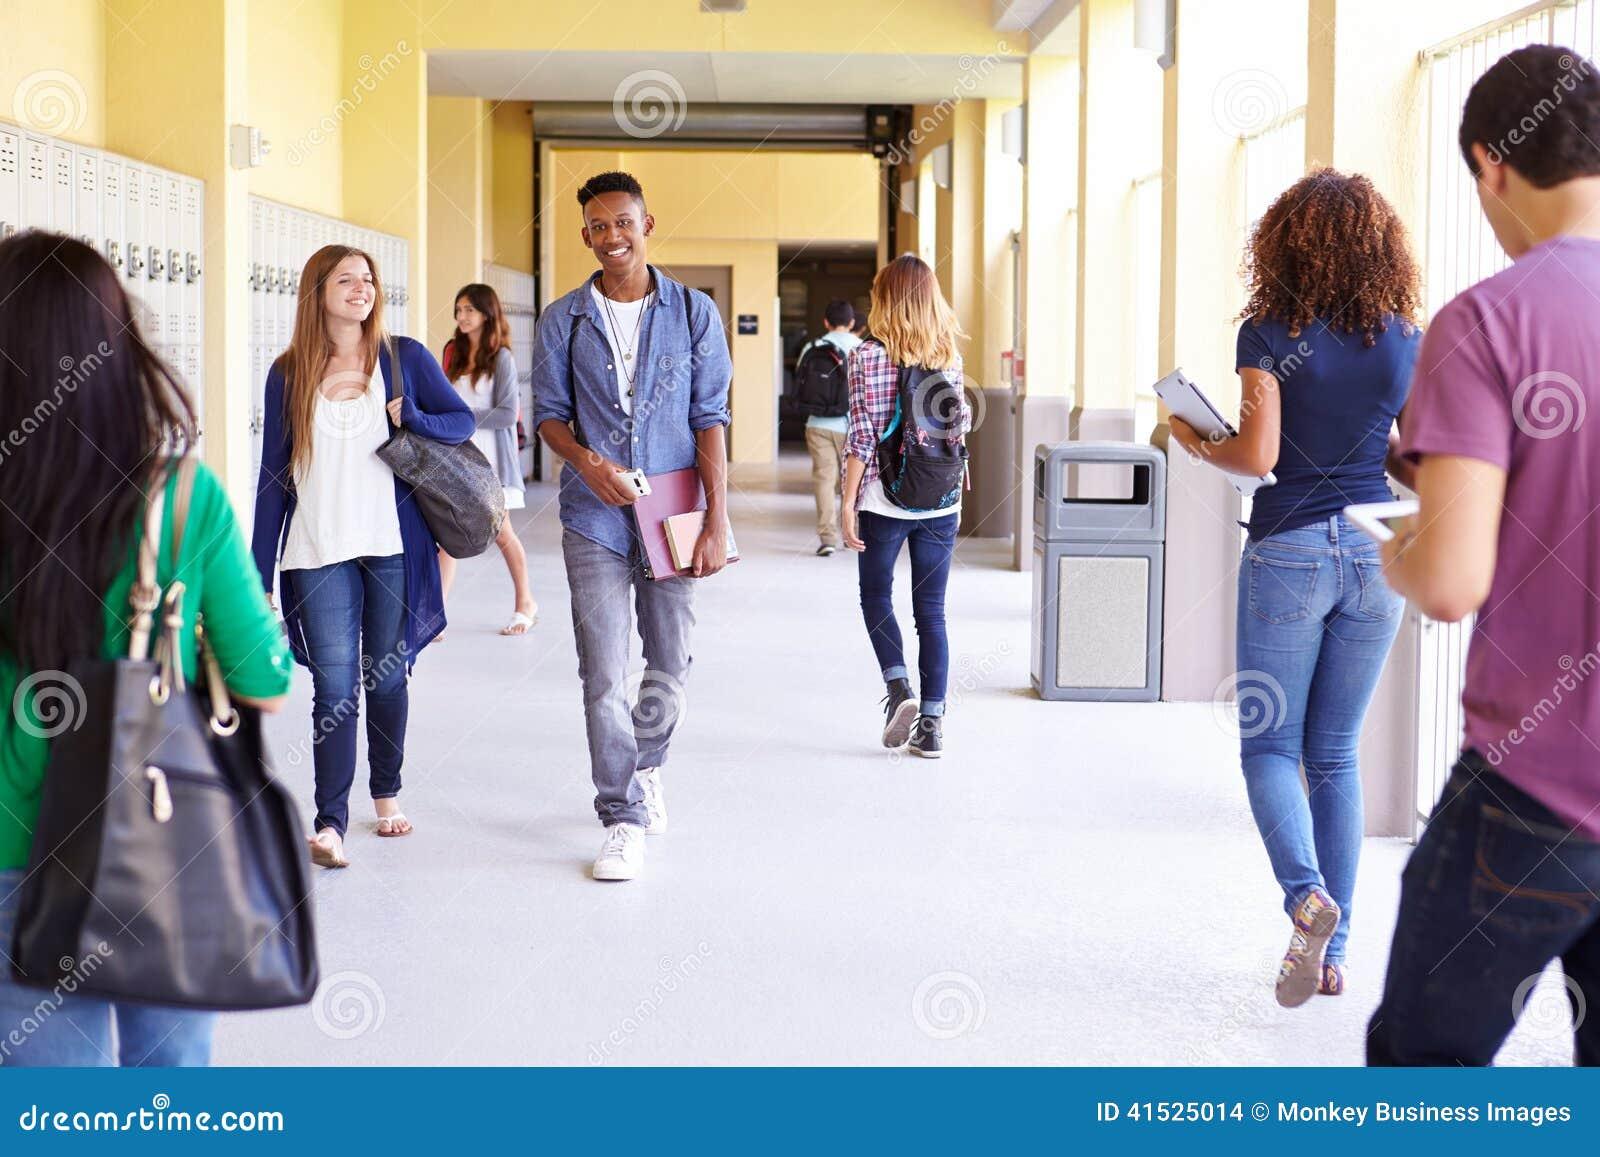 Highschool Students Walking